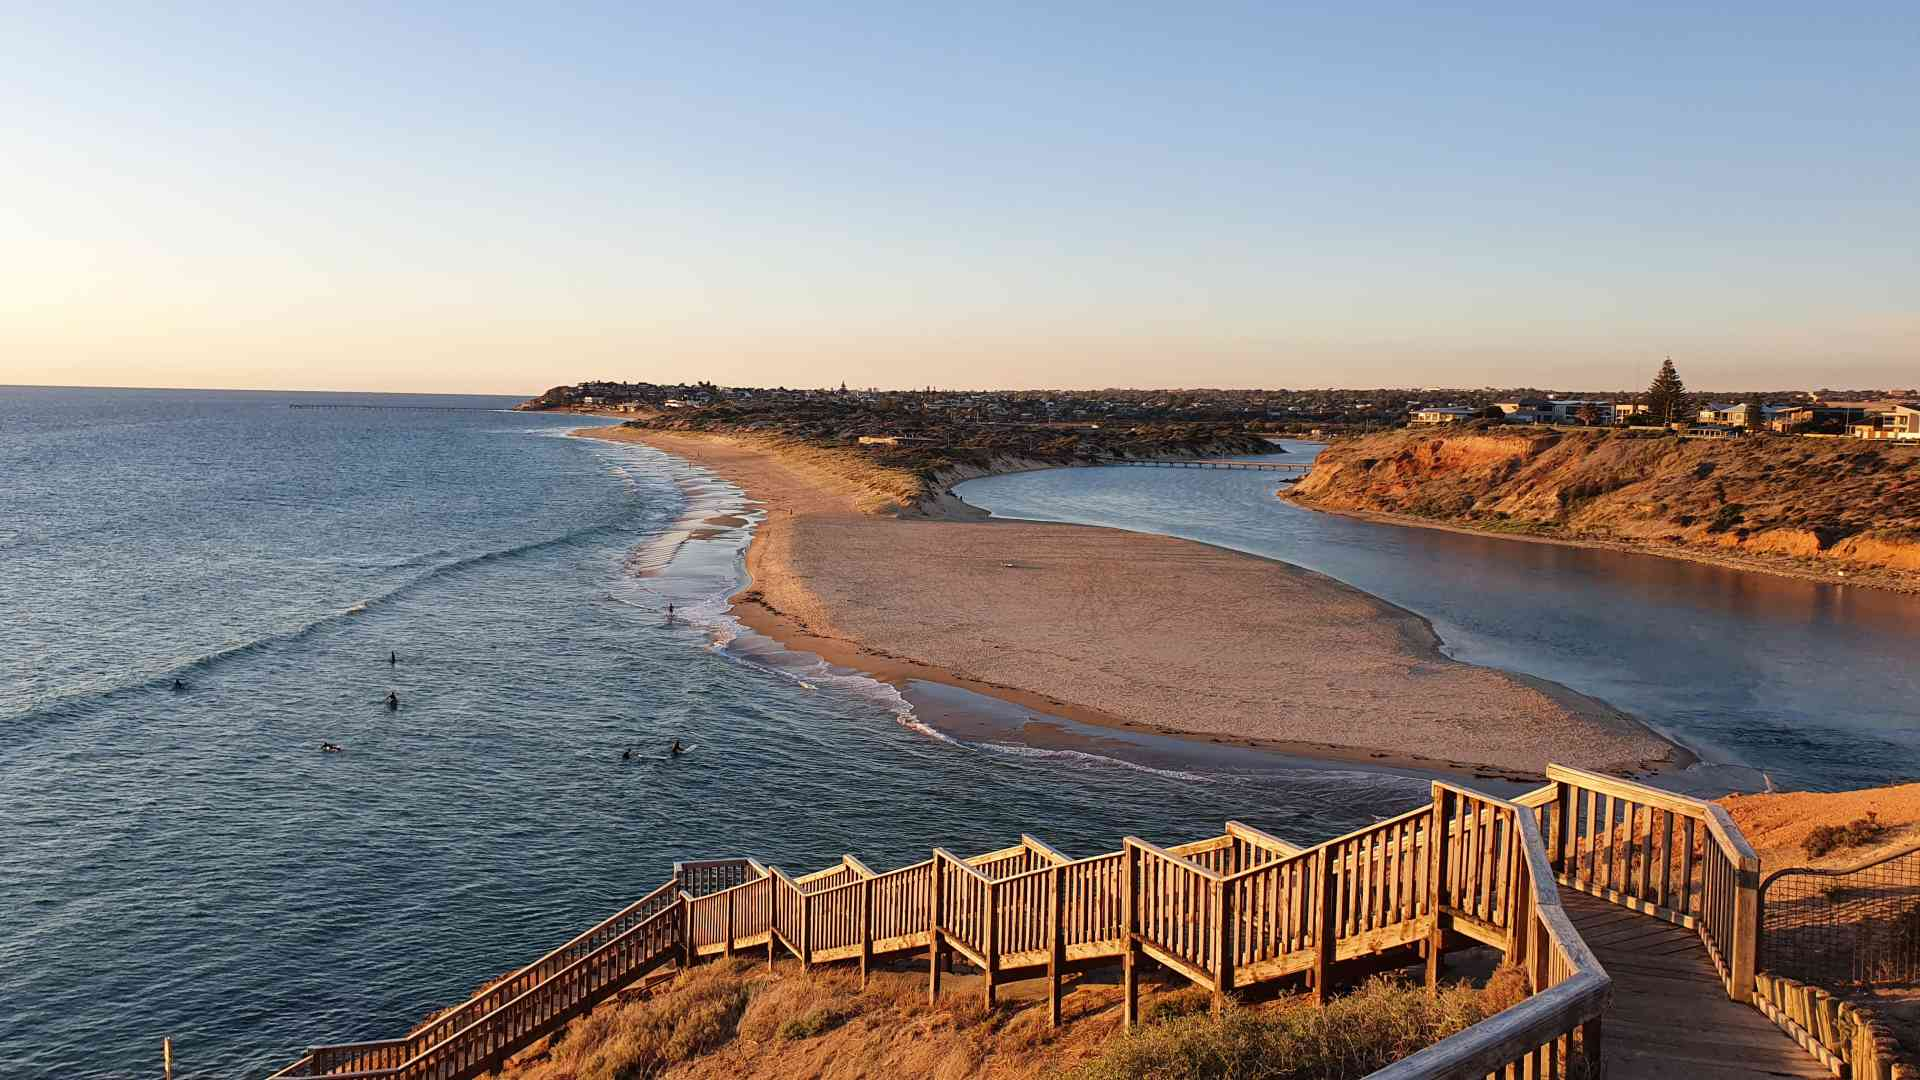 Port Noarlunga Beach by Dennis Bunnik